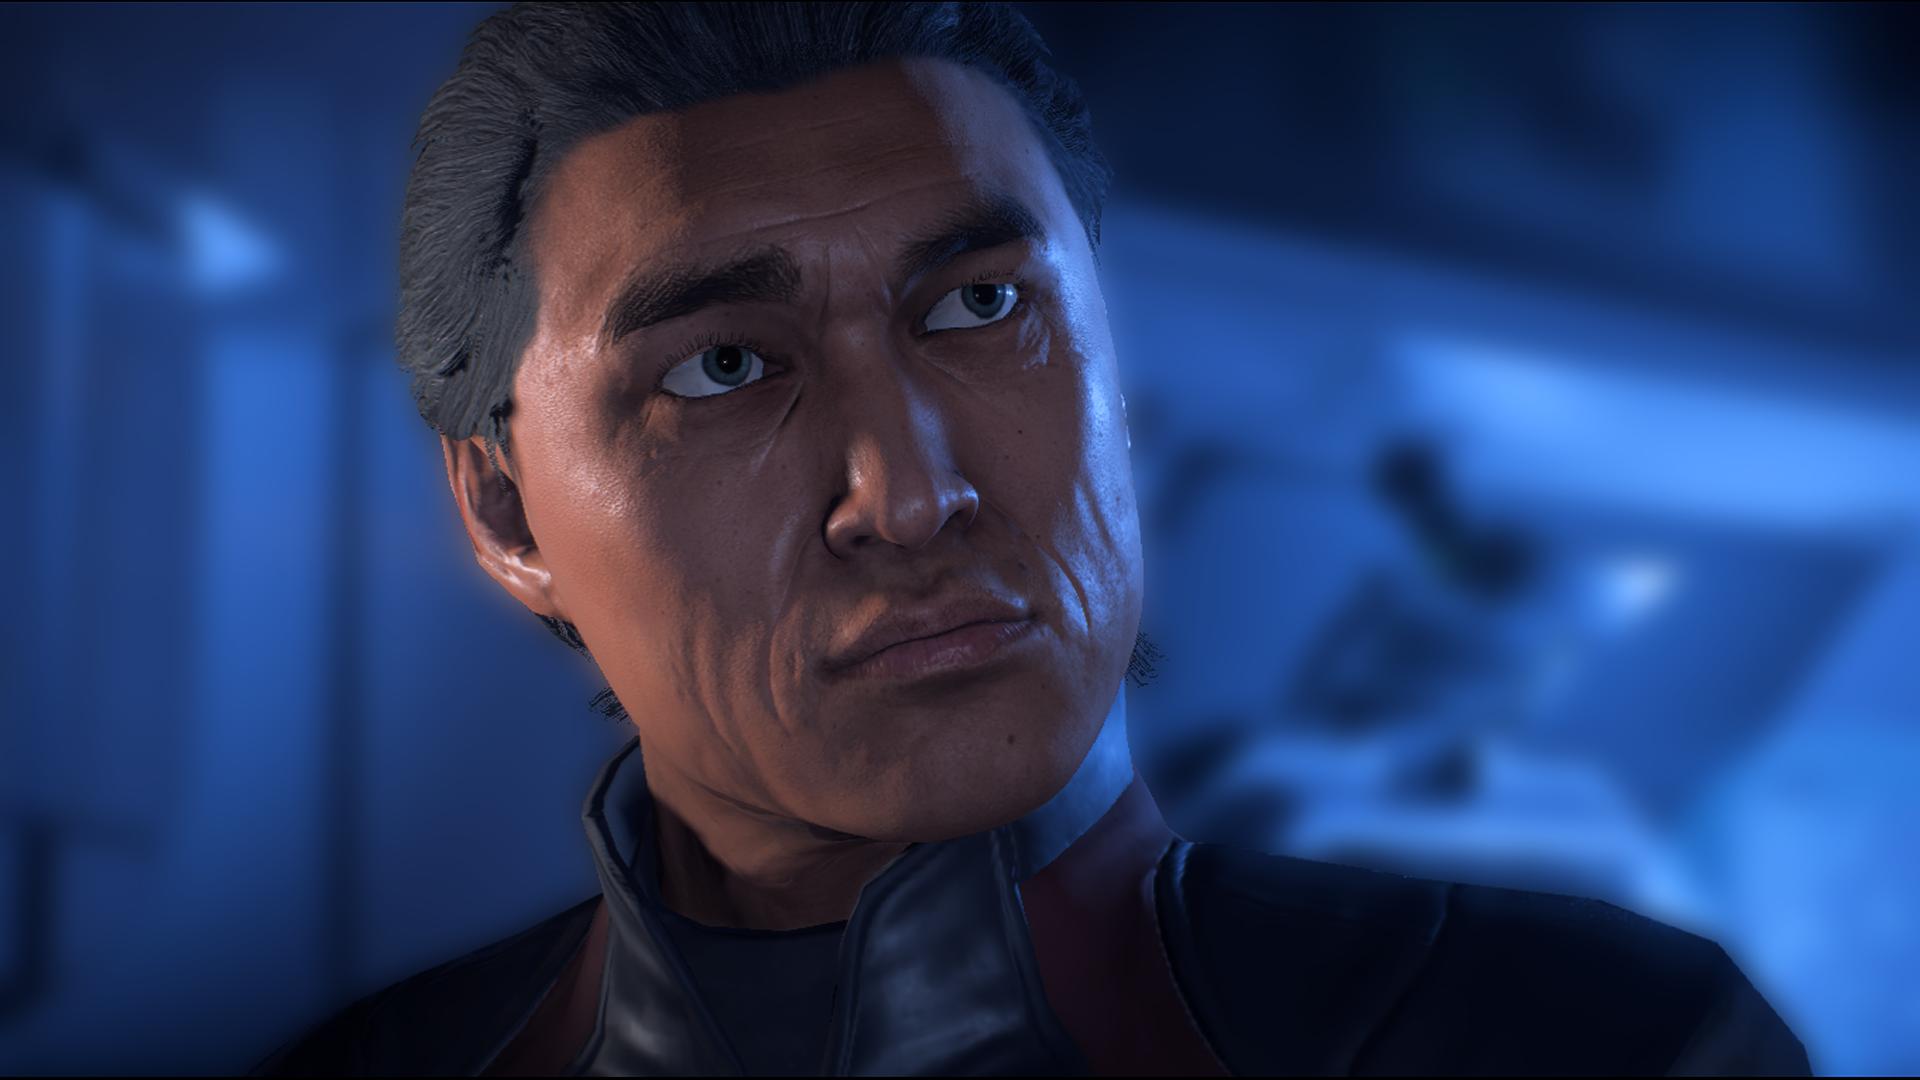 Pimp my Ryder: Eure Sara/Euer Scott - Mass Effect Andromeda - D·A·CH ...